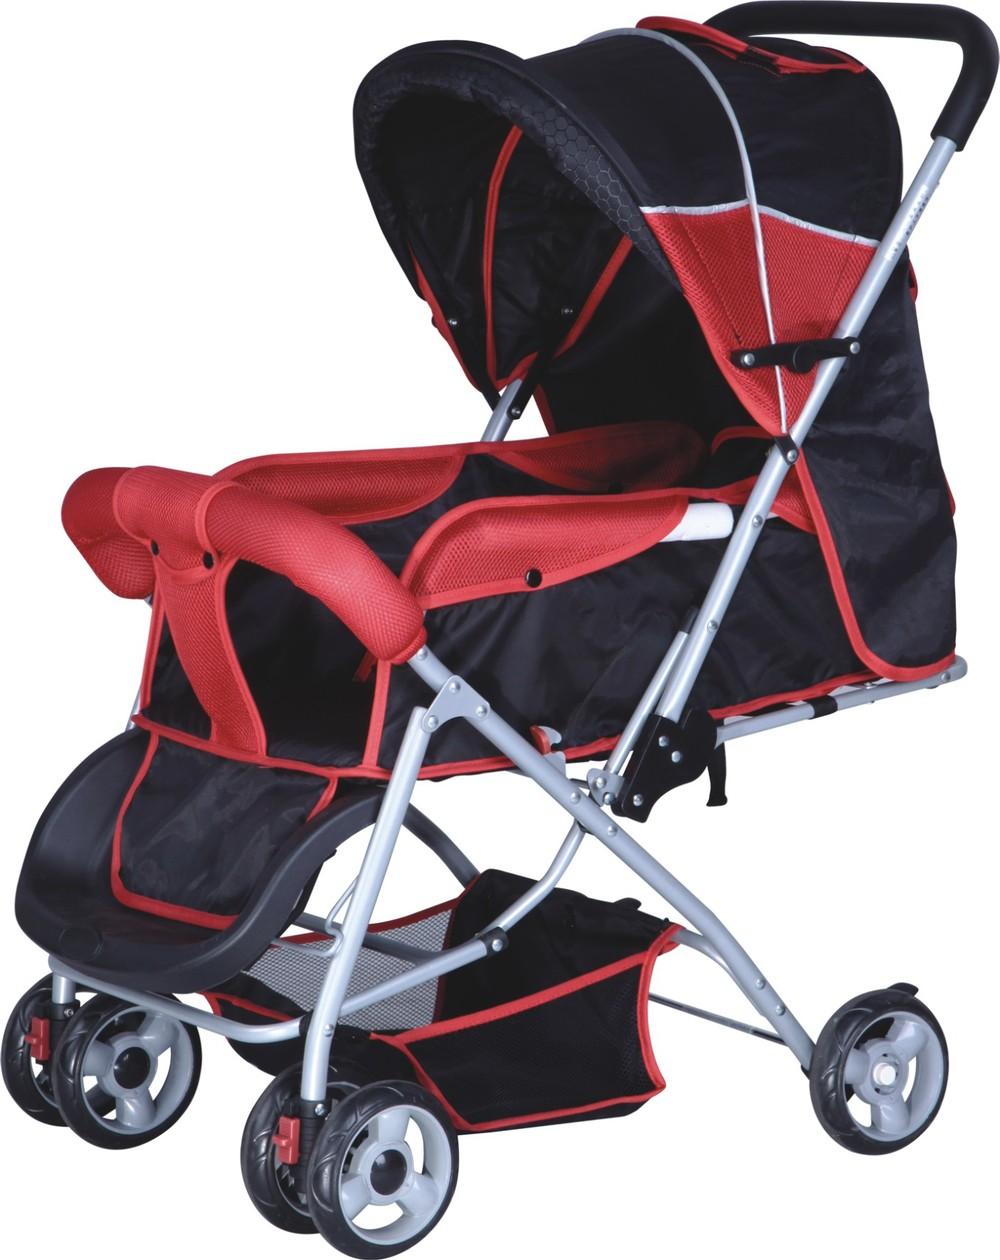 Adult Baby Stroller Custom Made Baby Stroller French Baby ...